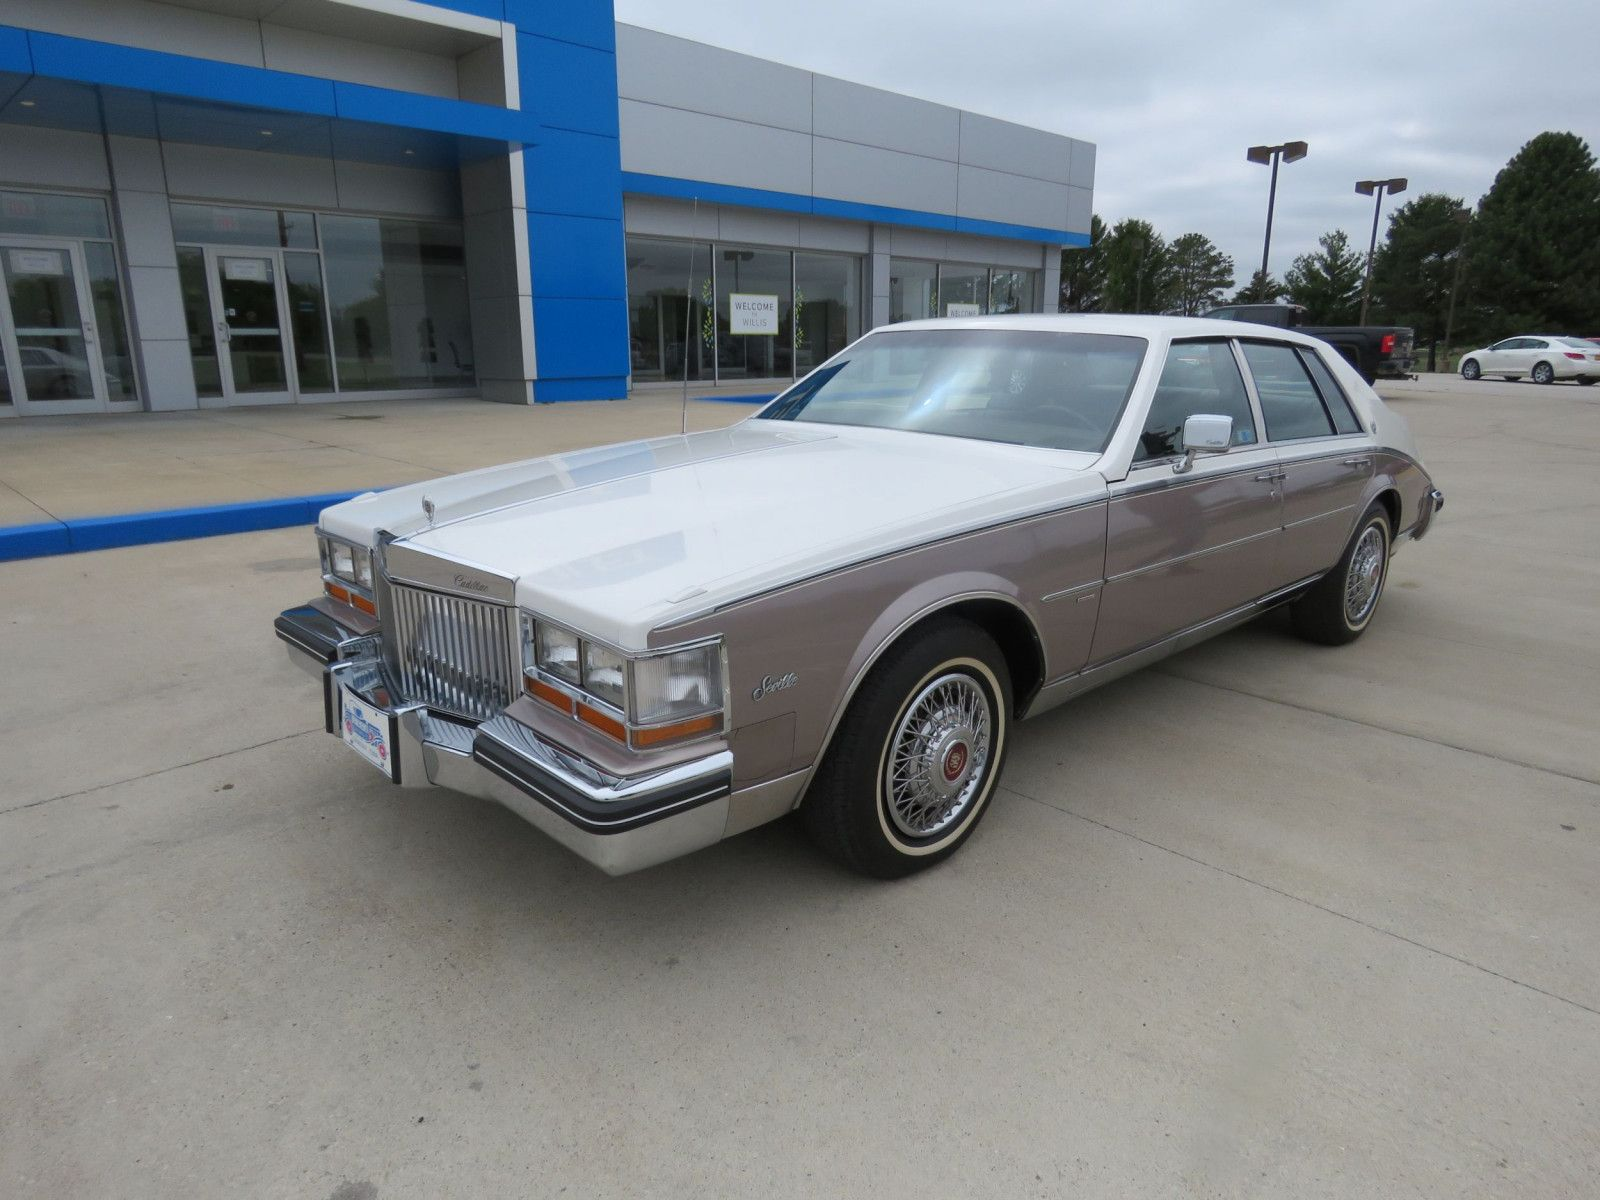 "<img src=""don-1982-cadillac.jpg"" alt=""A 1982 Cadillac Seville Diesel"">"